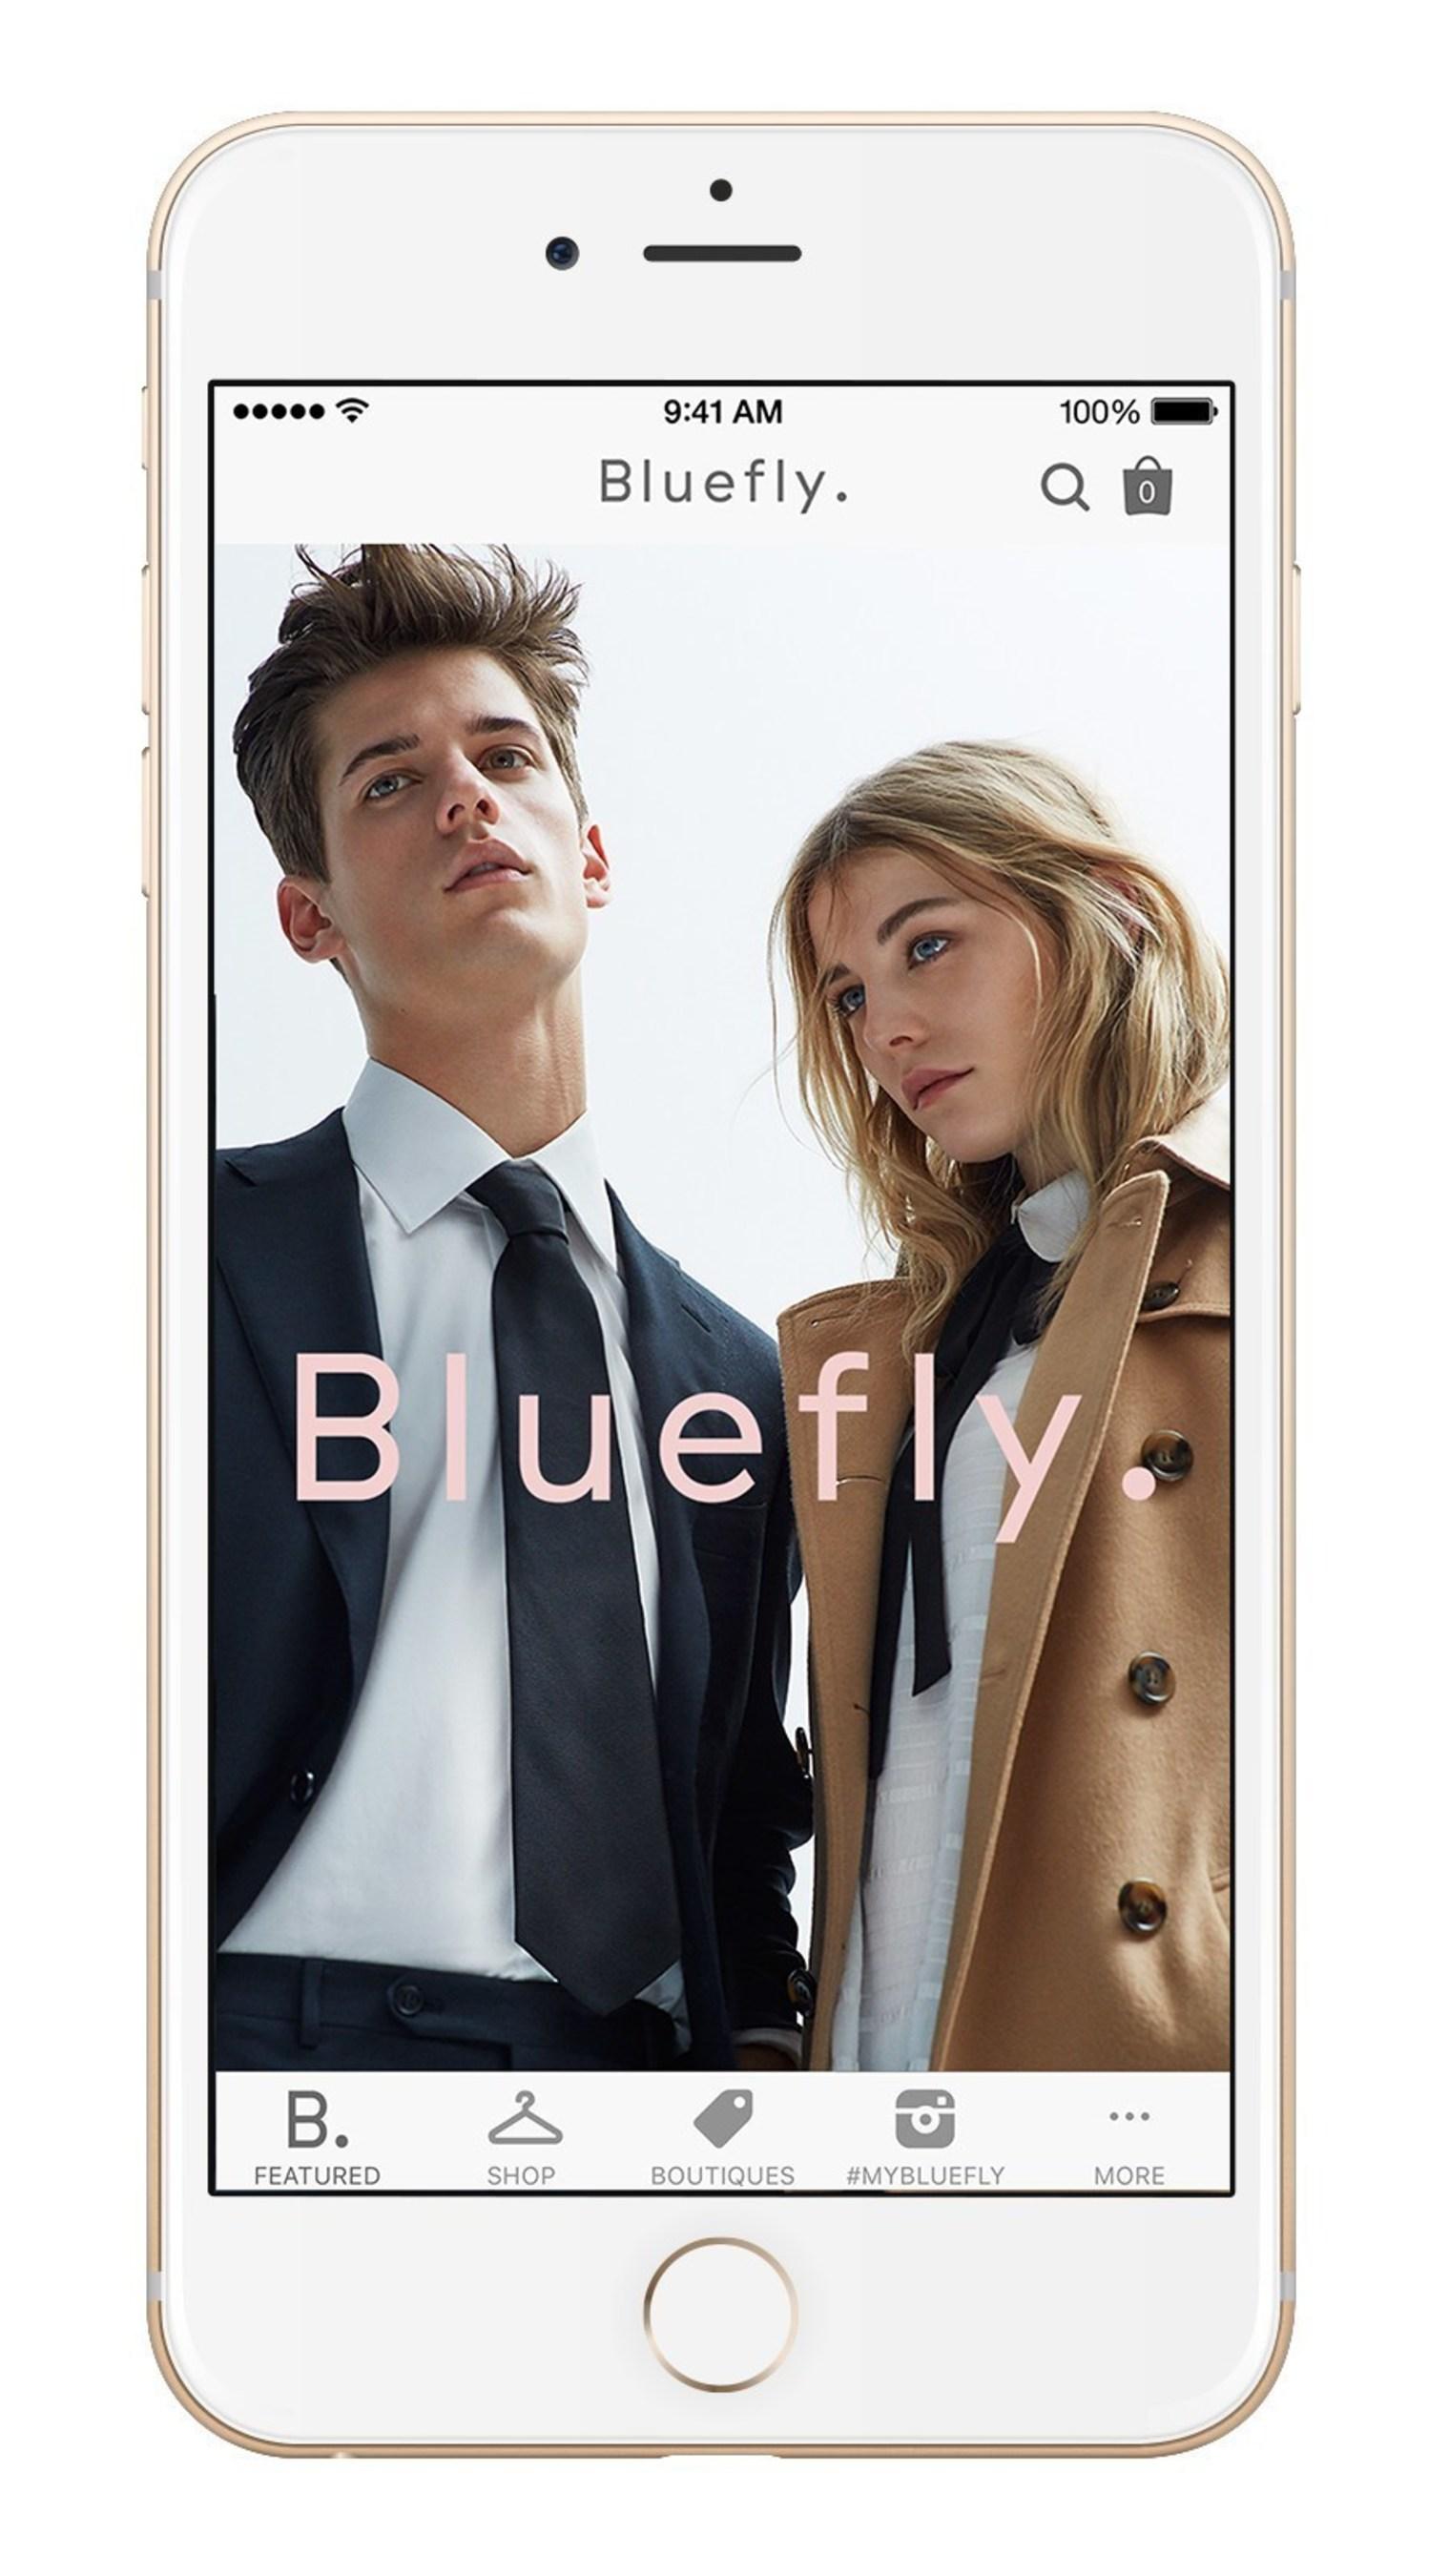 Bluefly app on iPhone